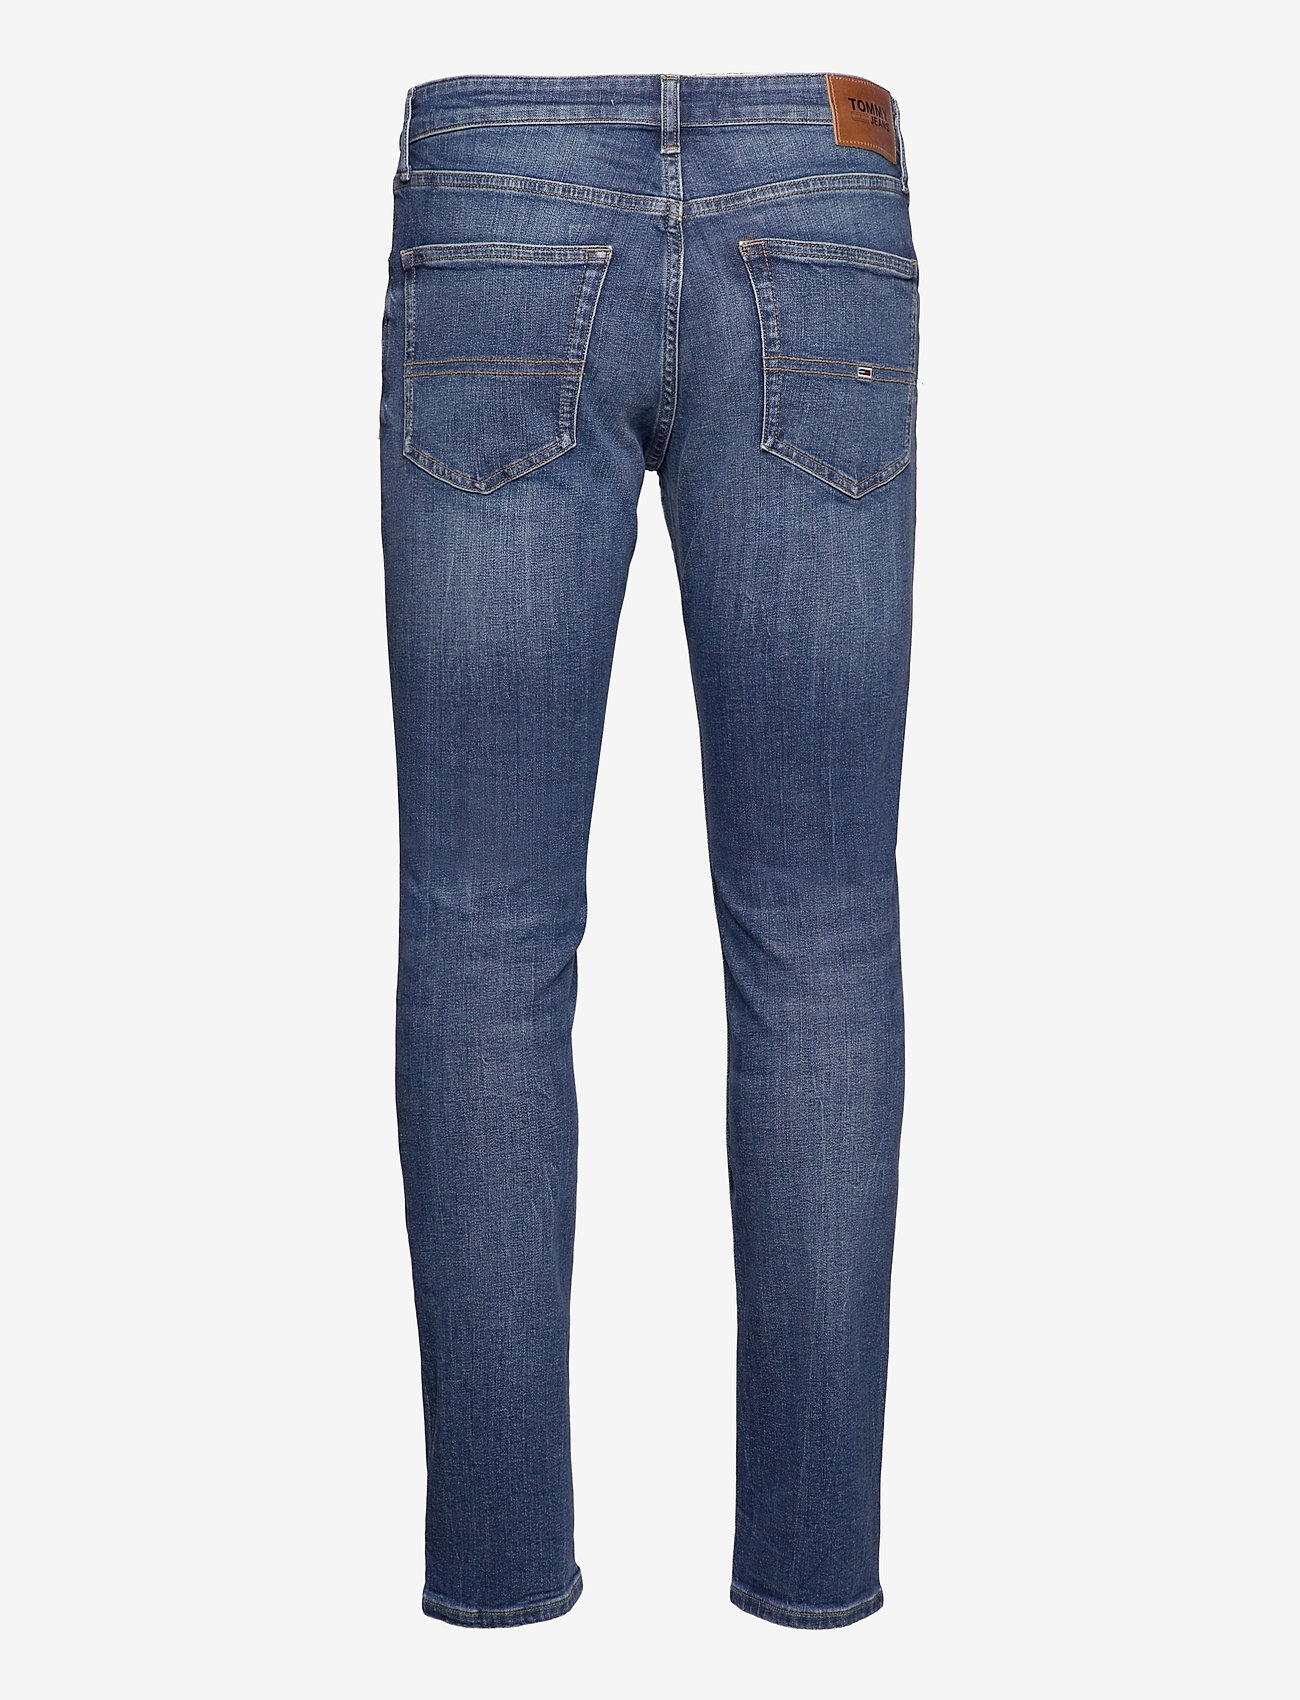 Tommy Jeans - SCANTON SLIM BE138 MBSTR - slim jeans - denim medium - 1